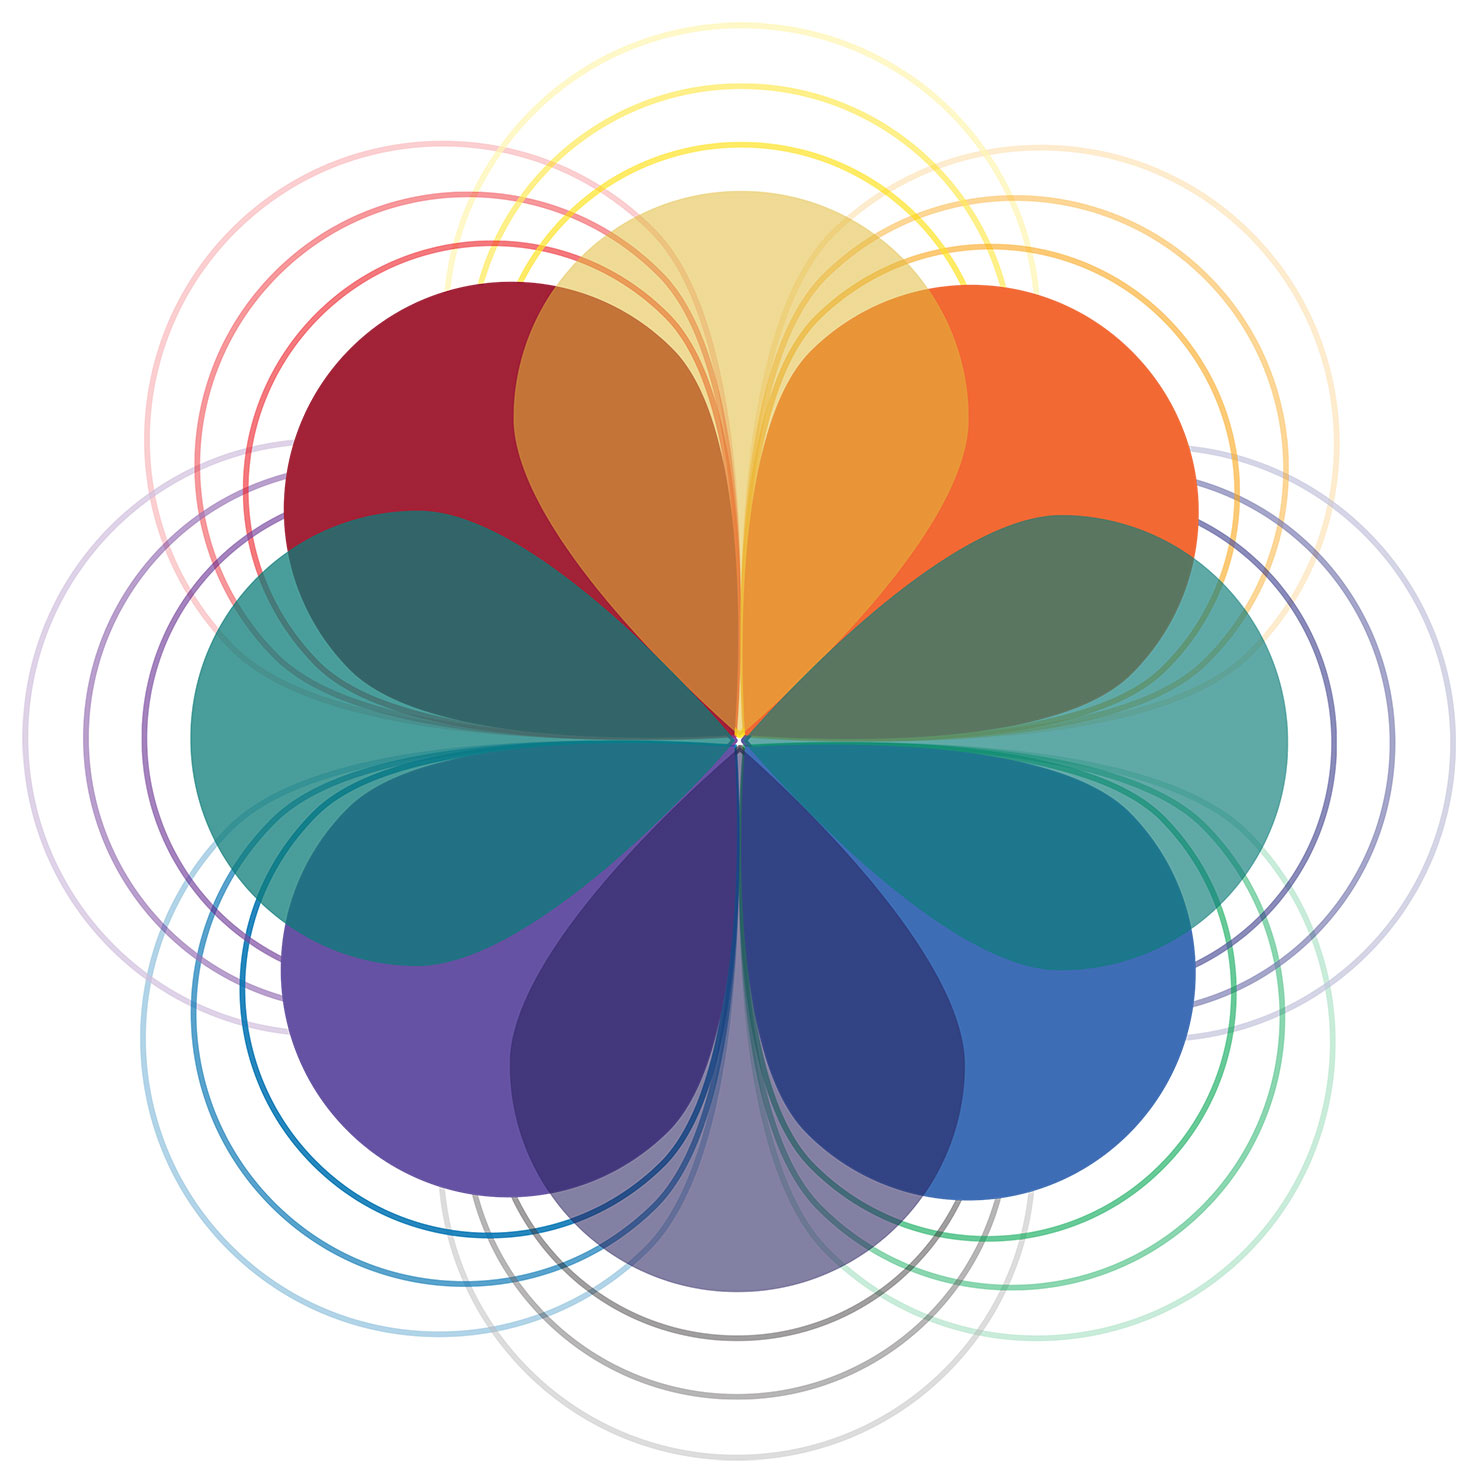 Music for Body Spirit Wellness Logo Design and Branding | Nicole Victory Design